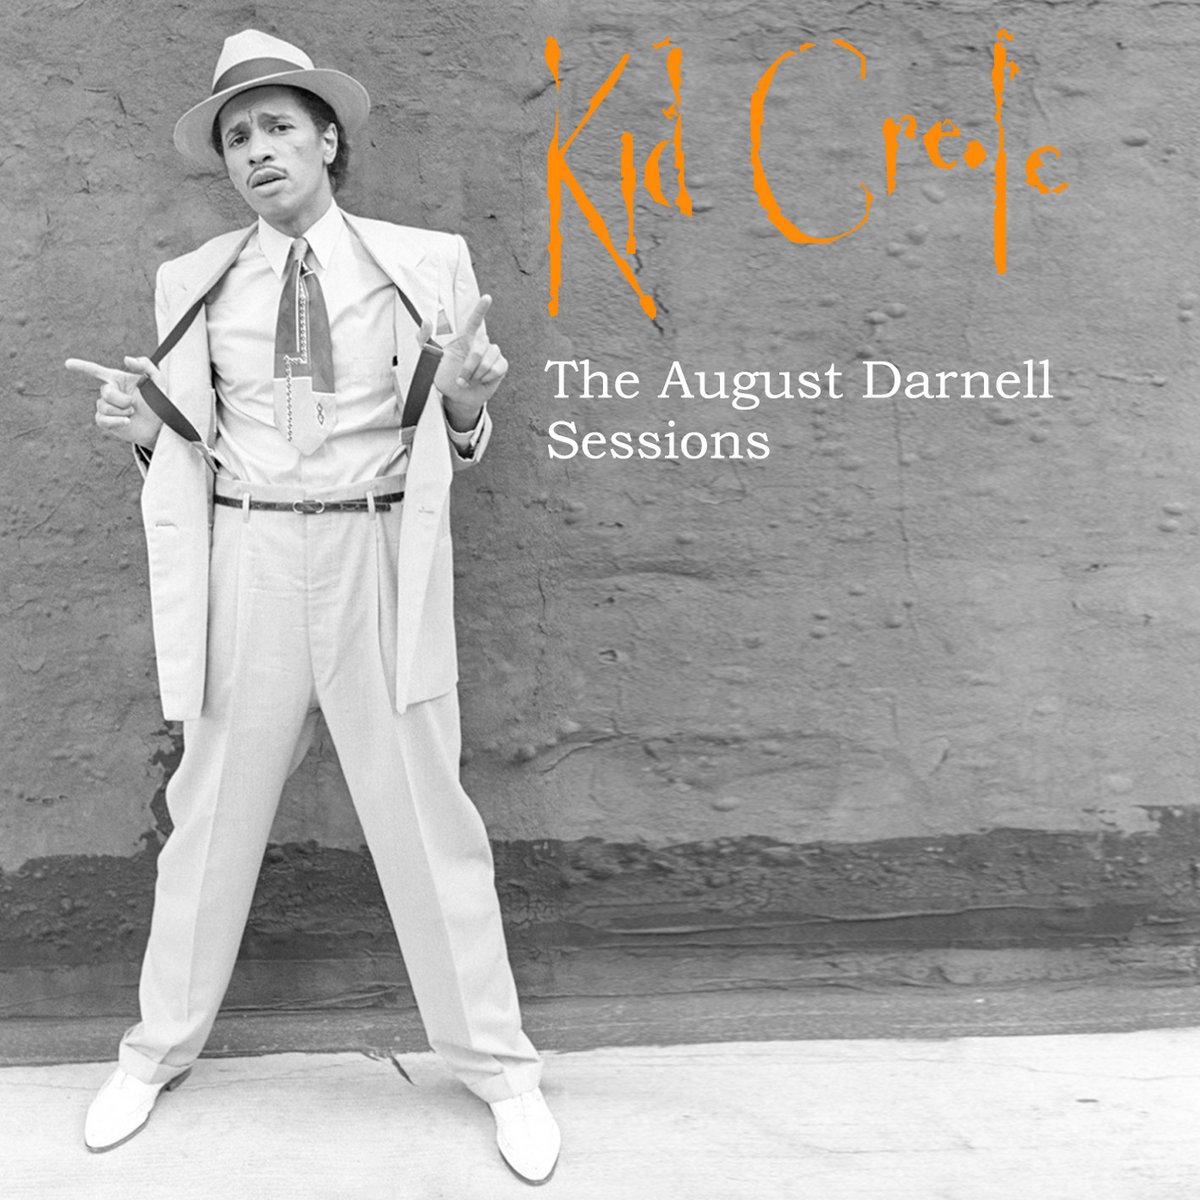 August Darnell